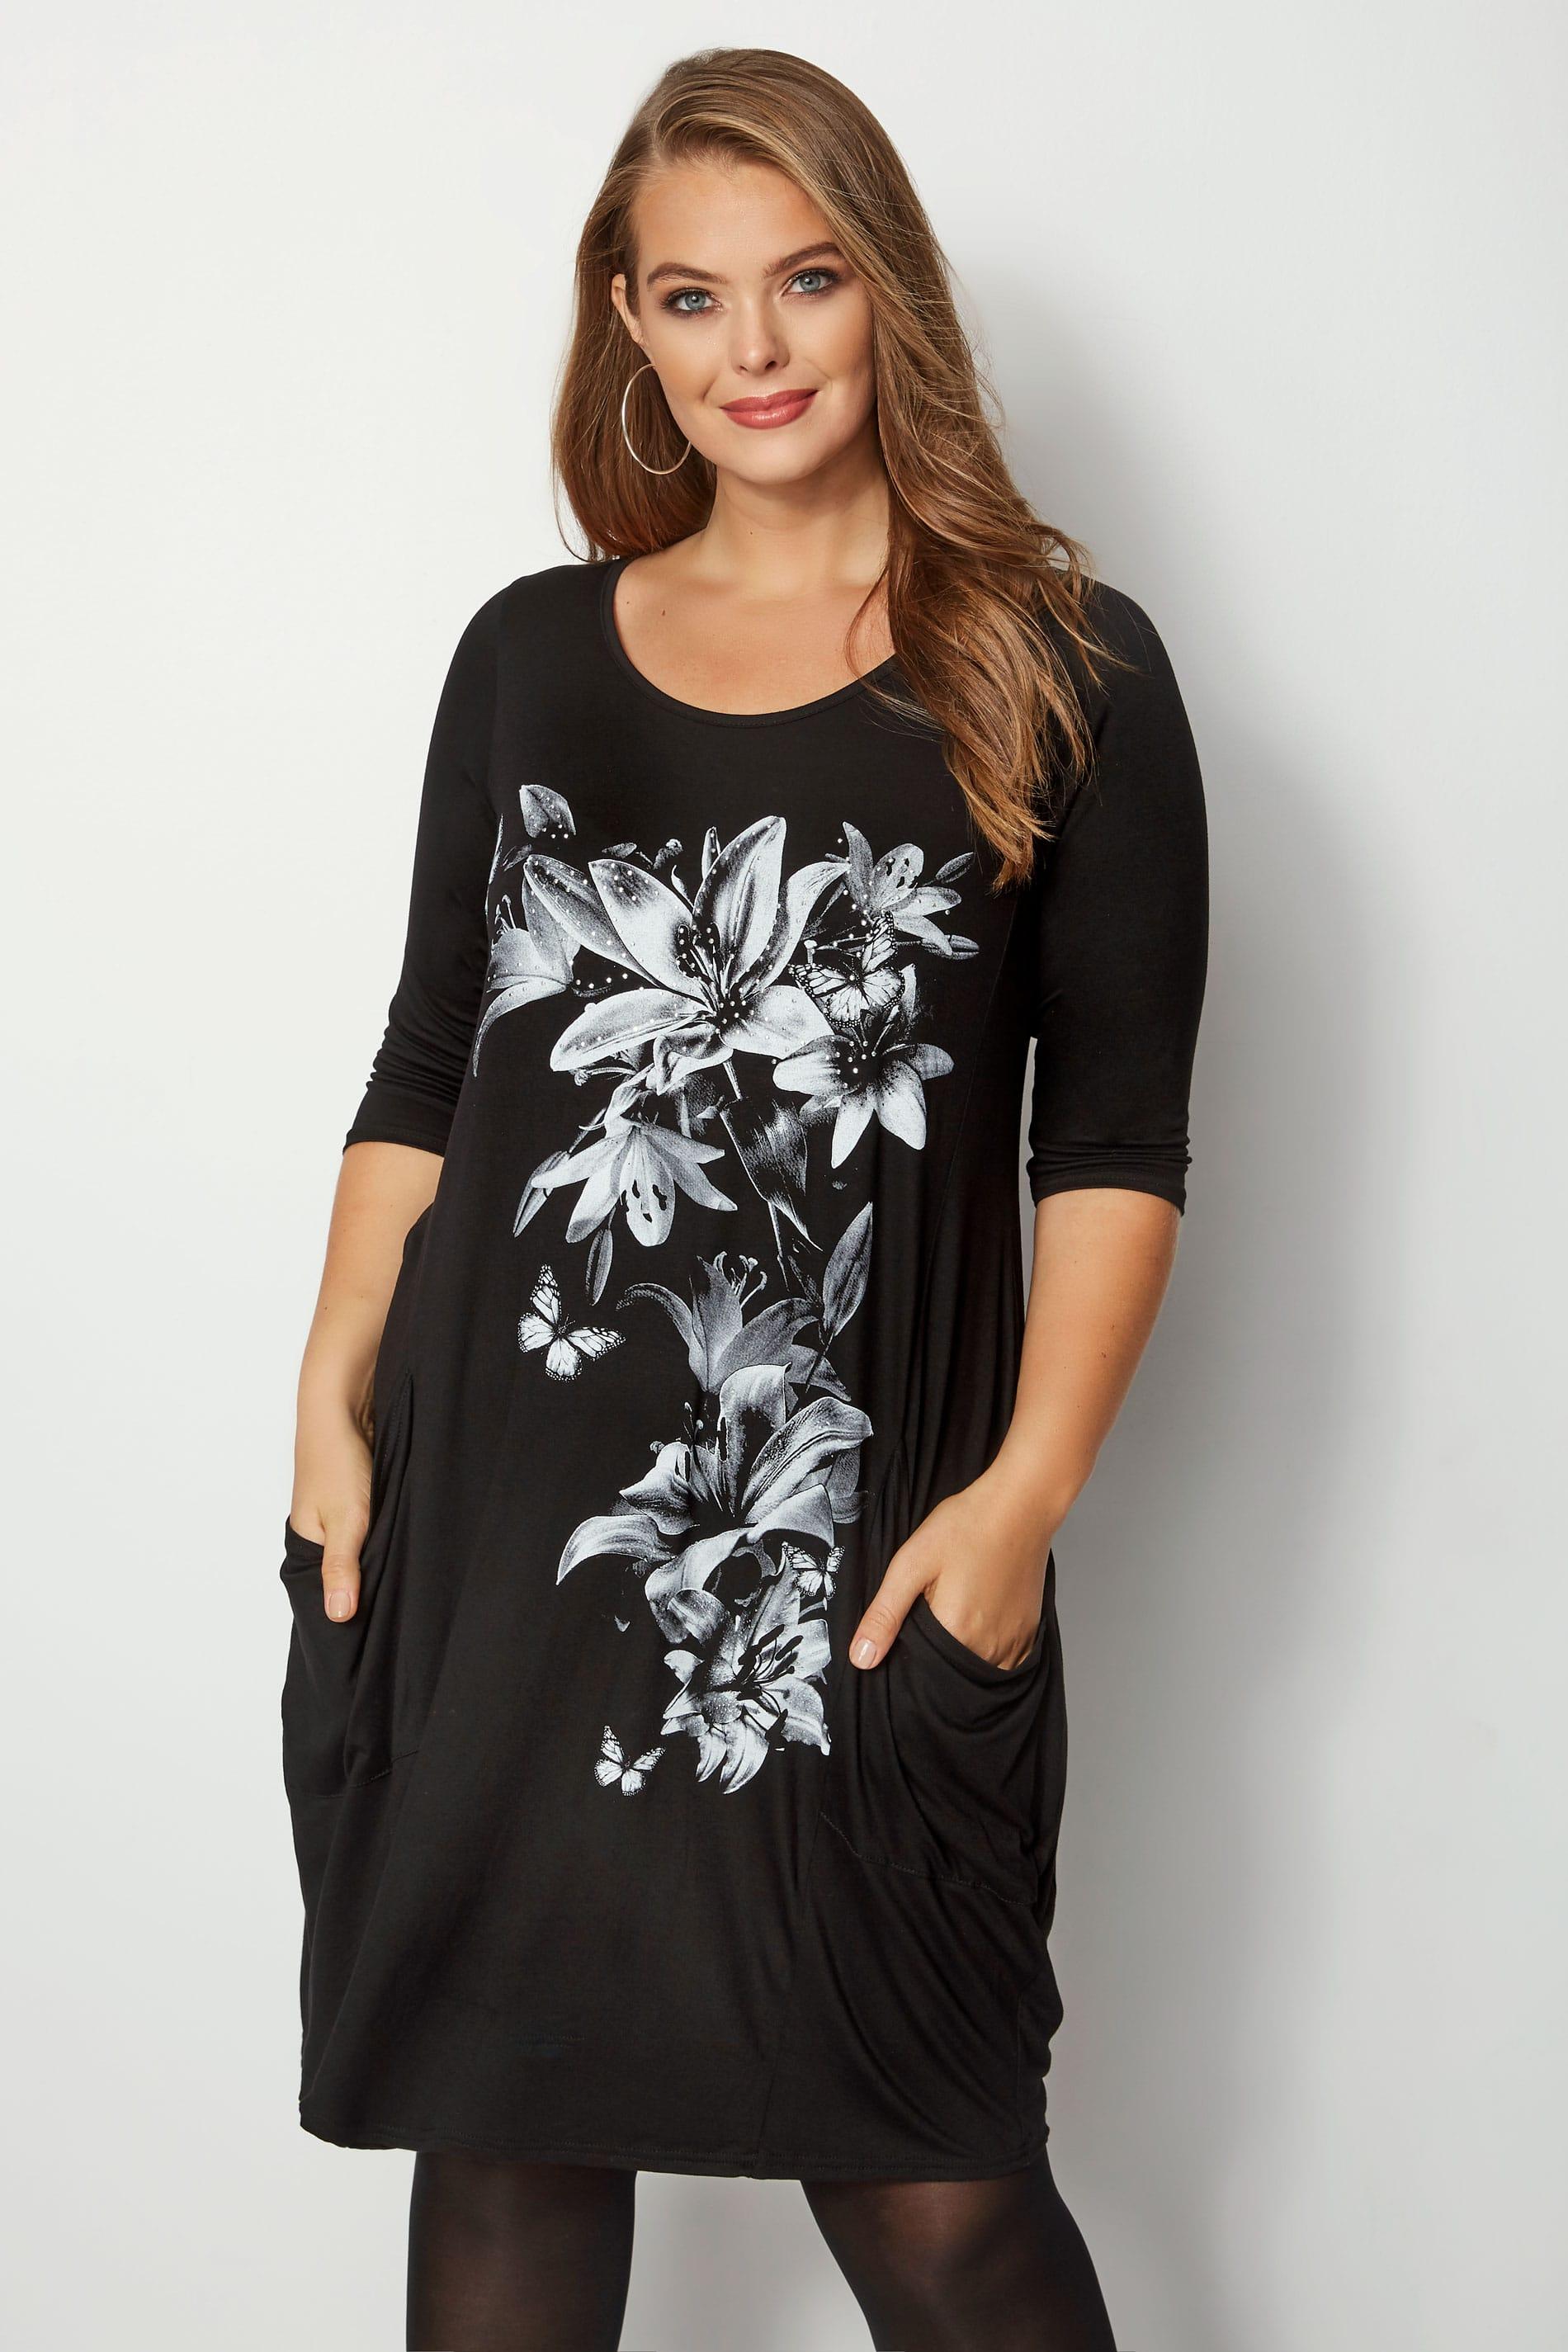 Black Floral Drape Pocket Dress